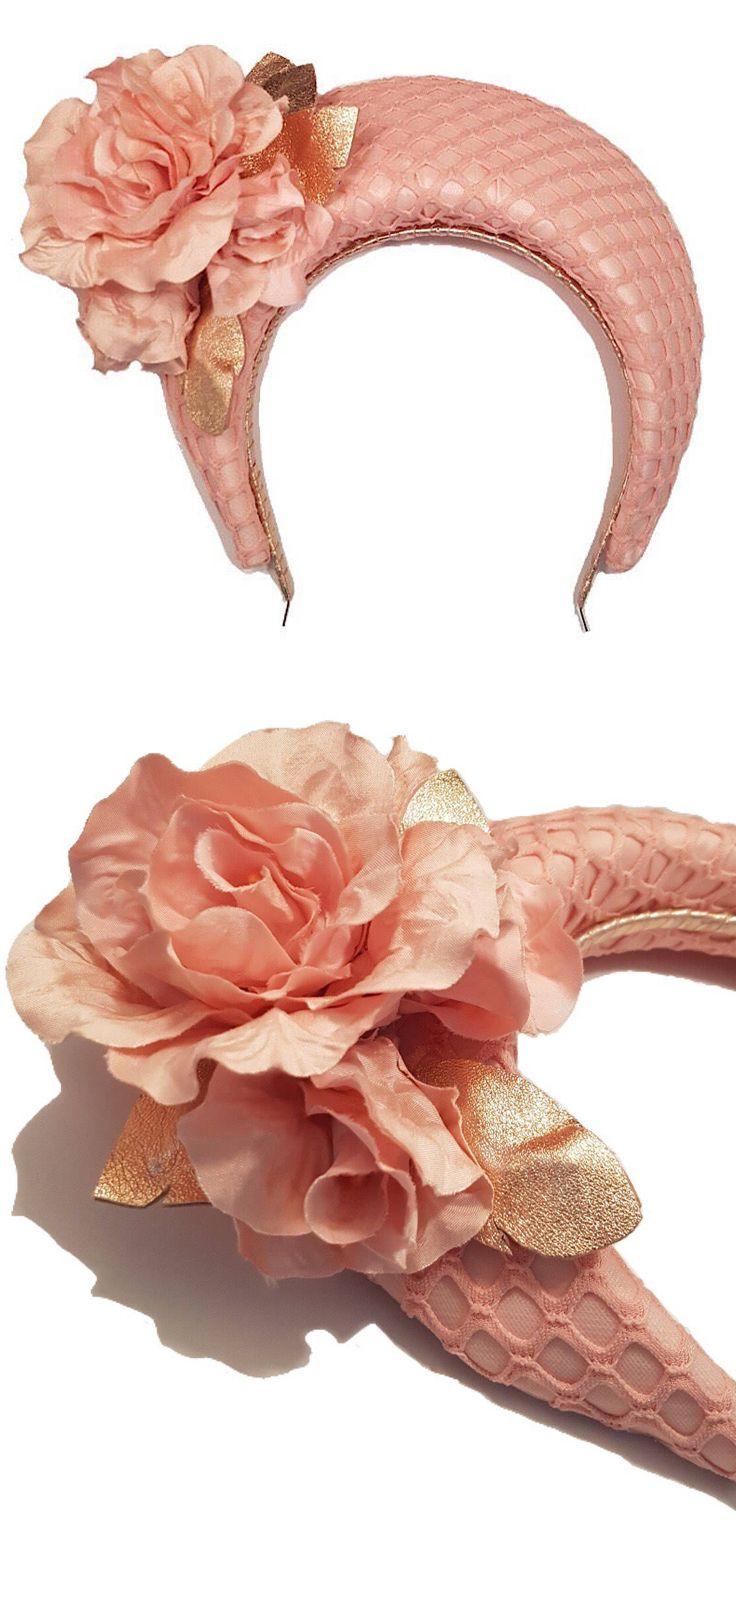 Floral crown racing fashion headpiece australian milliners on etsy floral crown racing fashion headpiece australian milliners on etsy pink floral crown hand blocked crown headpiece has been covered w izmirmasajfo